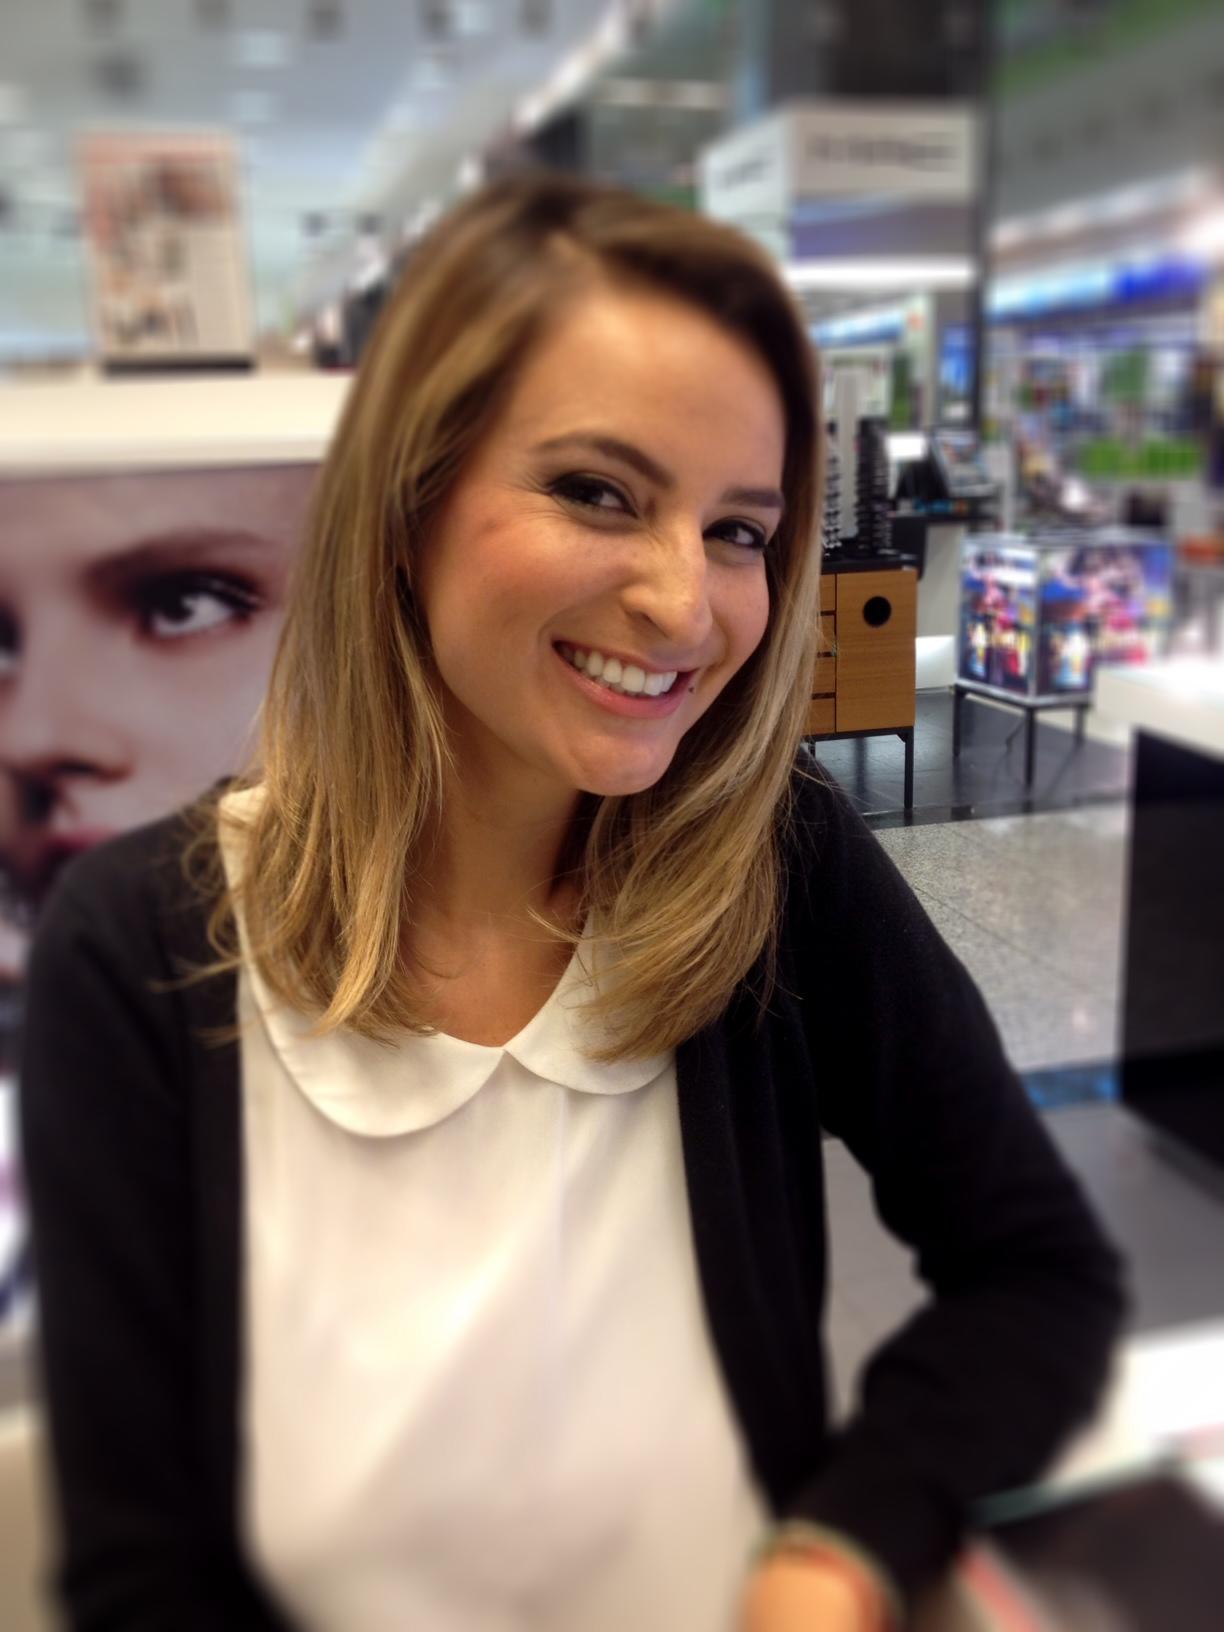 christina santos calvin klein makeup review